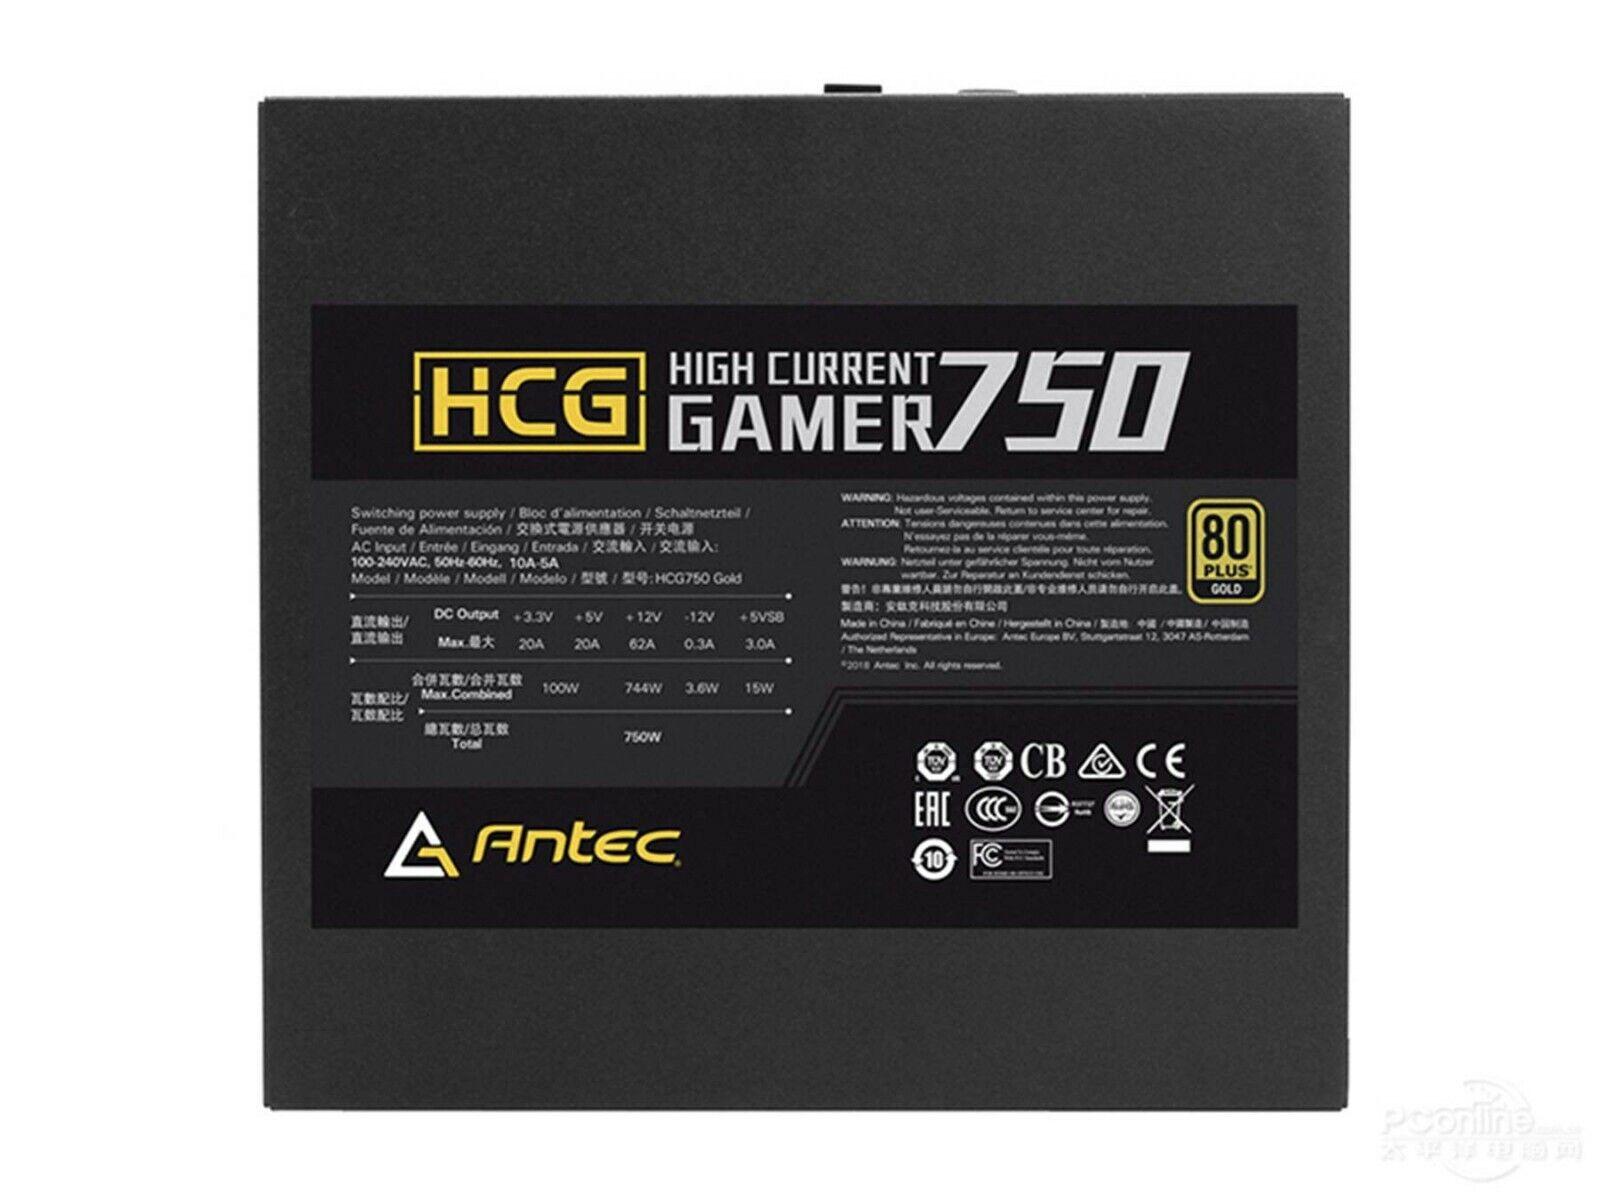 6+2pin PCI-E VGA Power Supply Cable for Antec HCG750 Gold and GPU 50cm